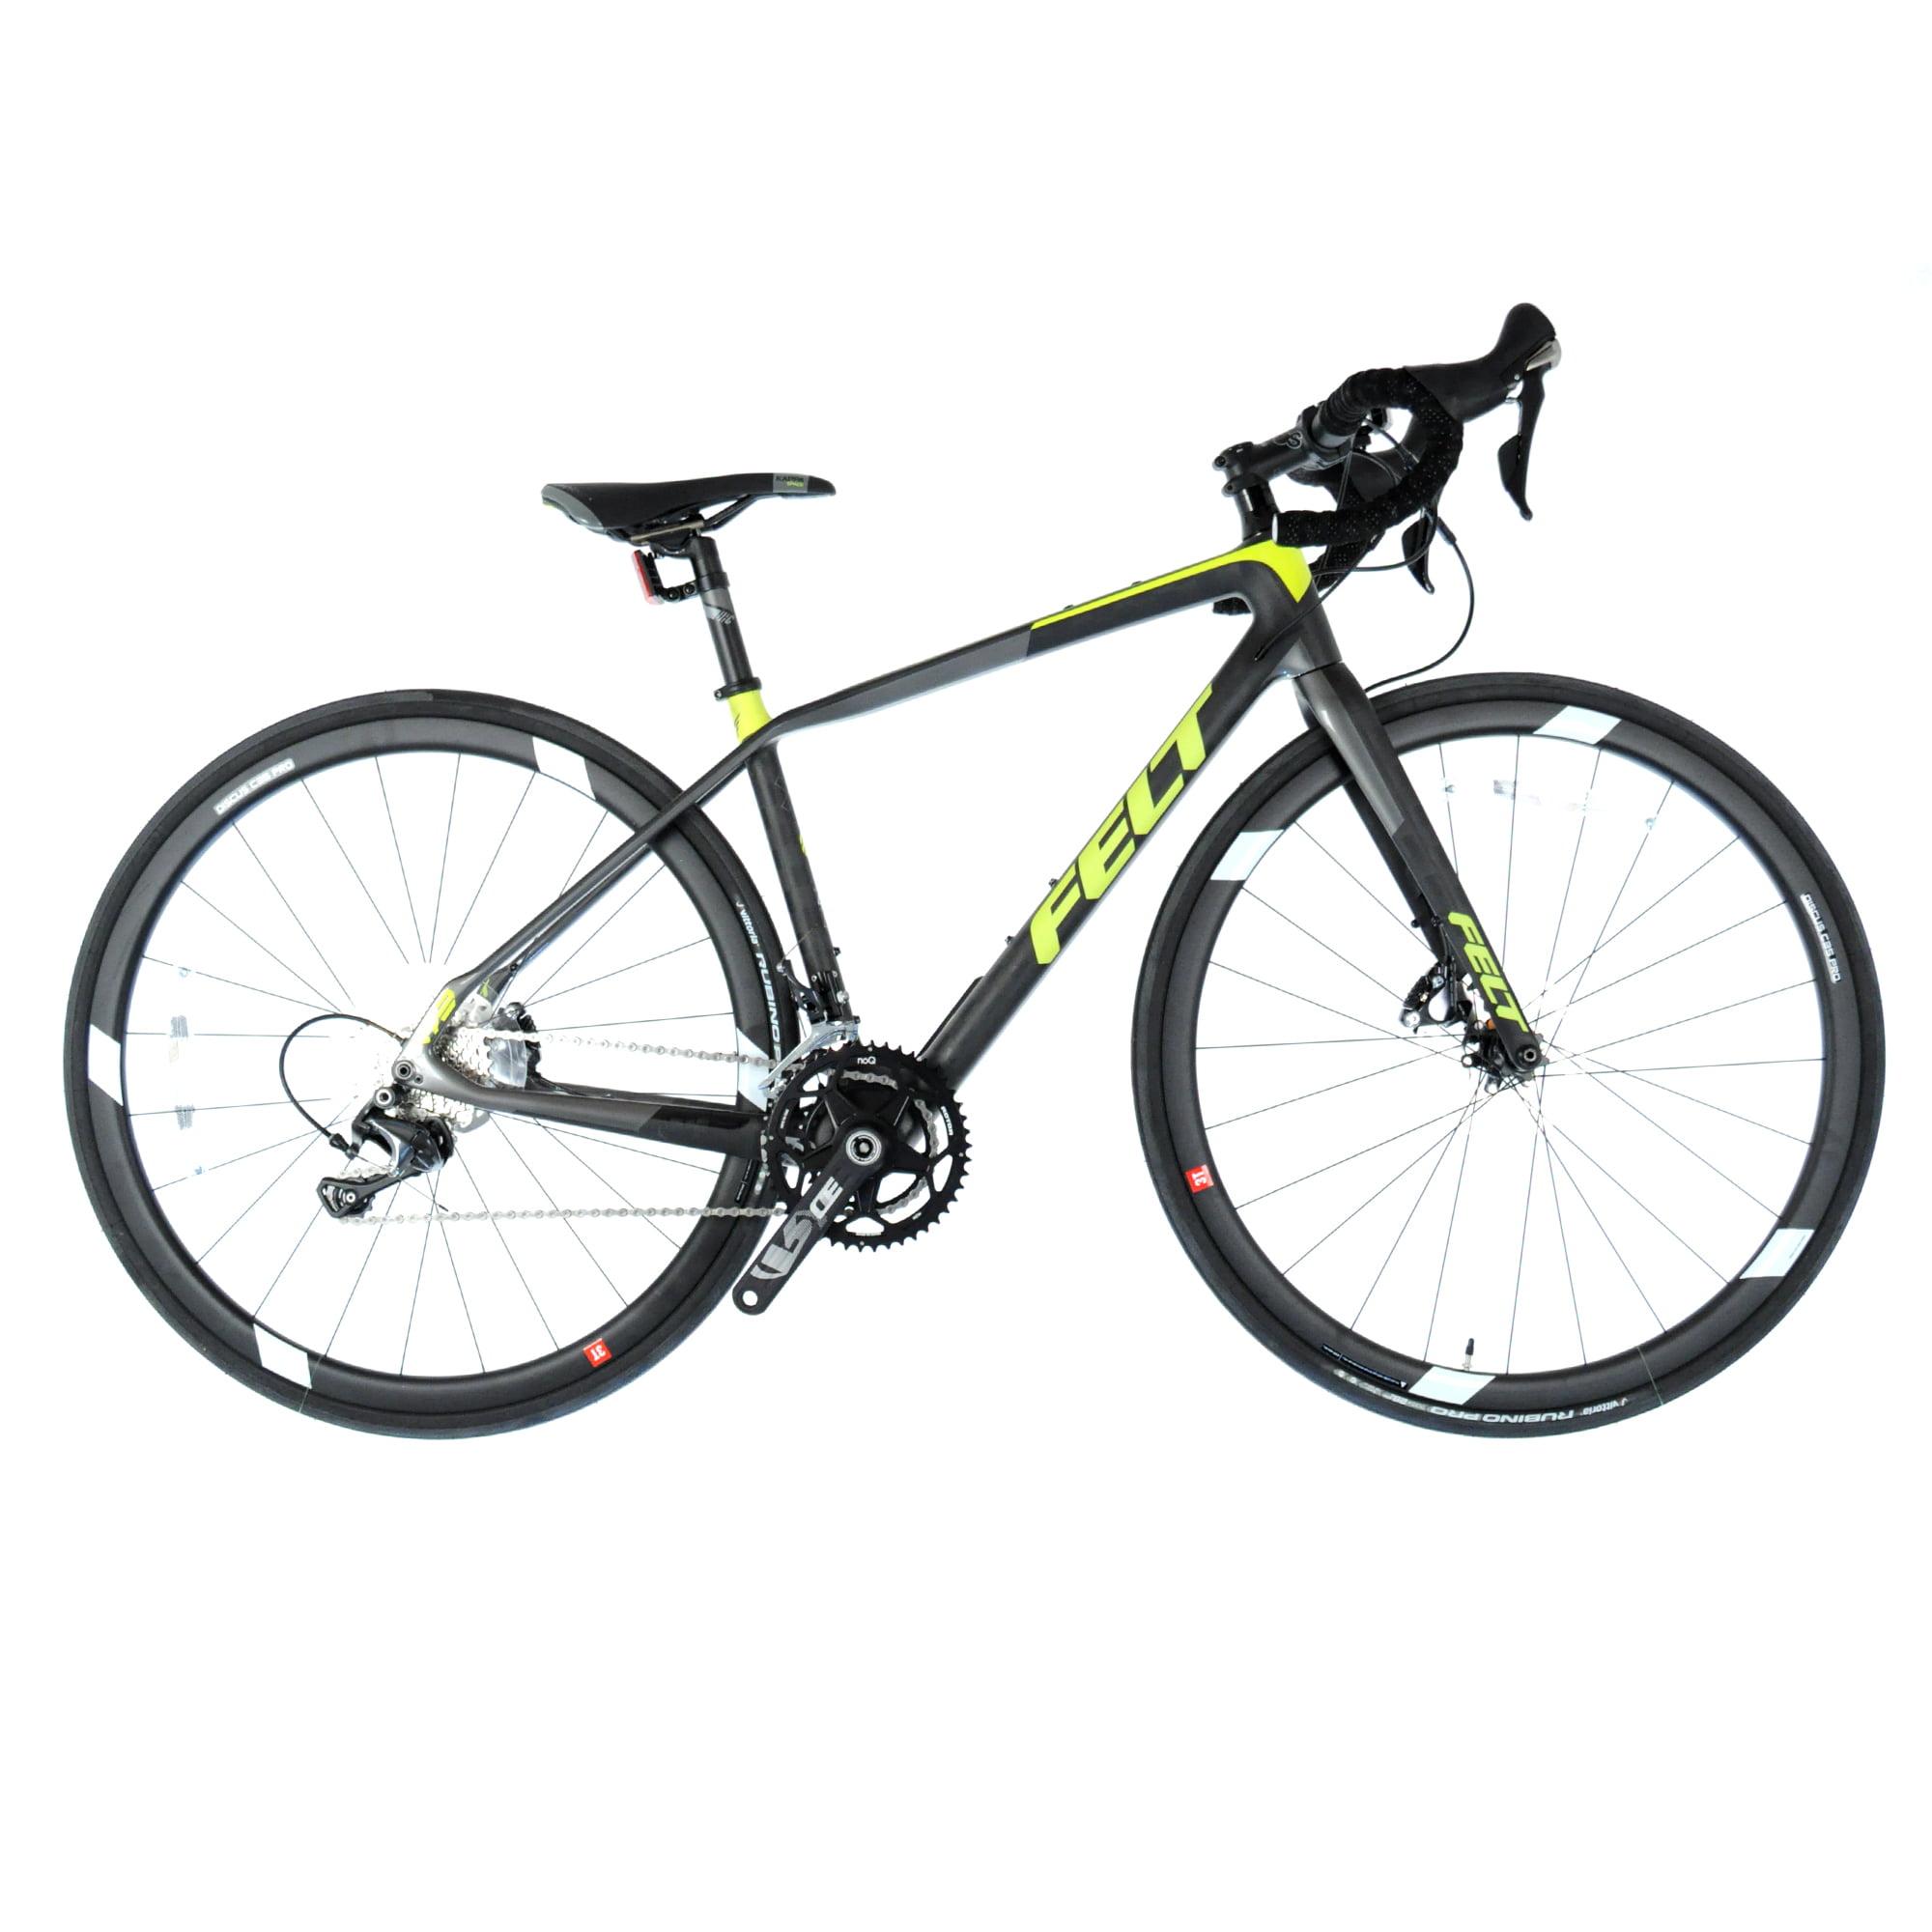 Felt VR3 Carbon Disc Road Bike Shimano Ultegra 6800 2x11-Speed 3T Rotor // 47cm